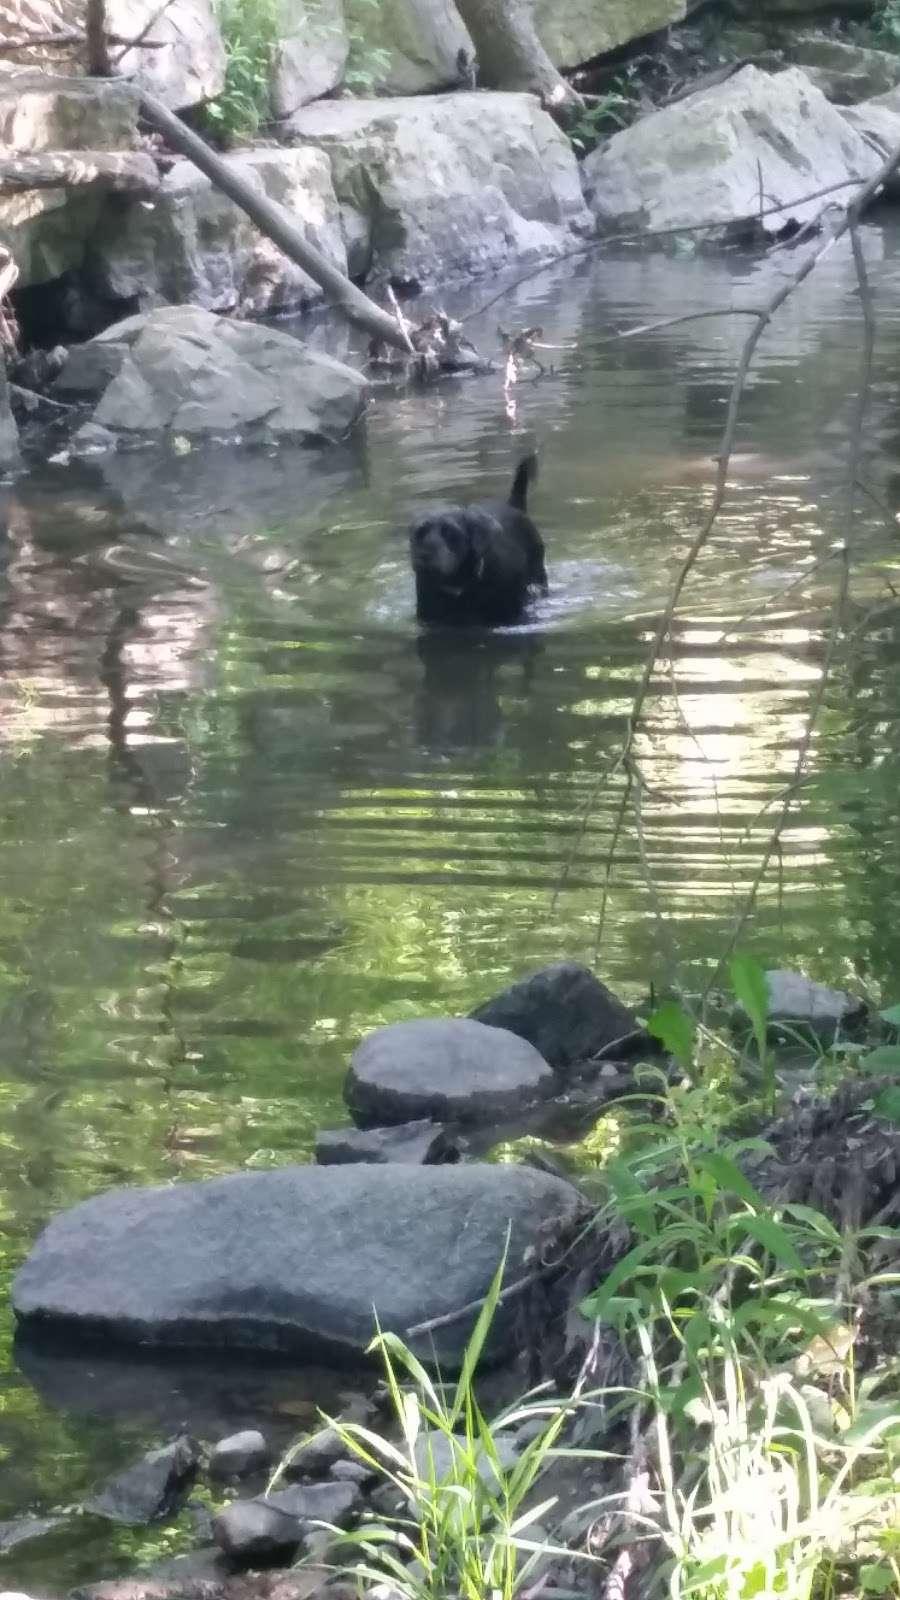 Kinnickinnic River Parkway - park  | Photo 4 of 10 | Address: W Rita Dr, Milwaukee, WI 53219, USA | Phone: (414) 643-0120